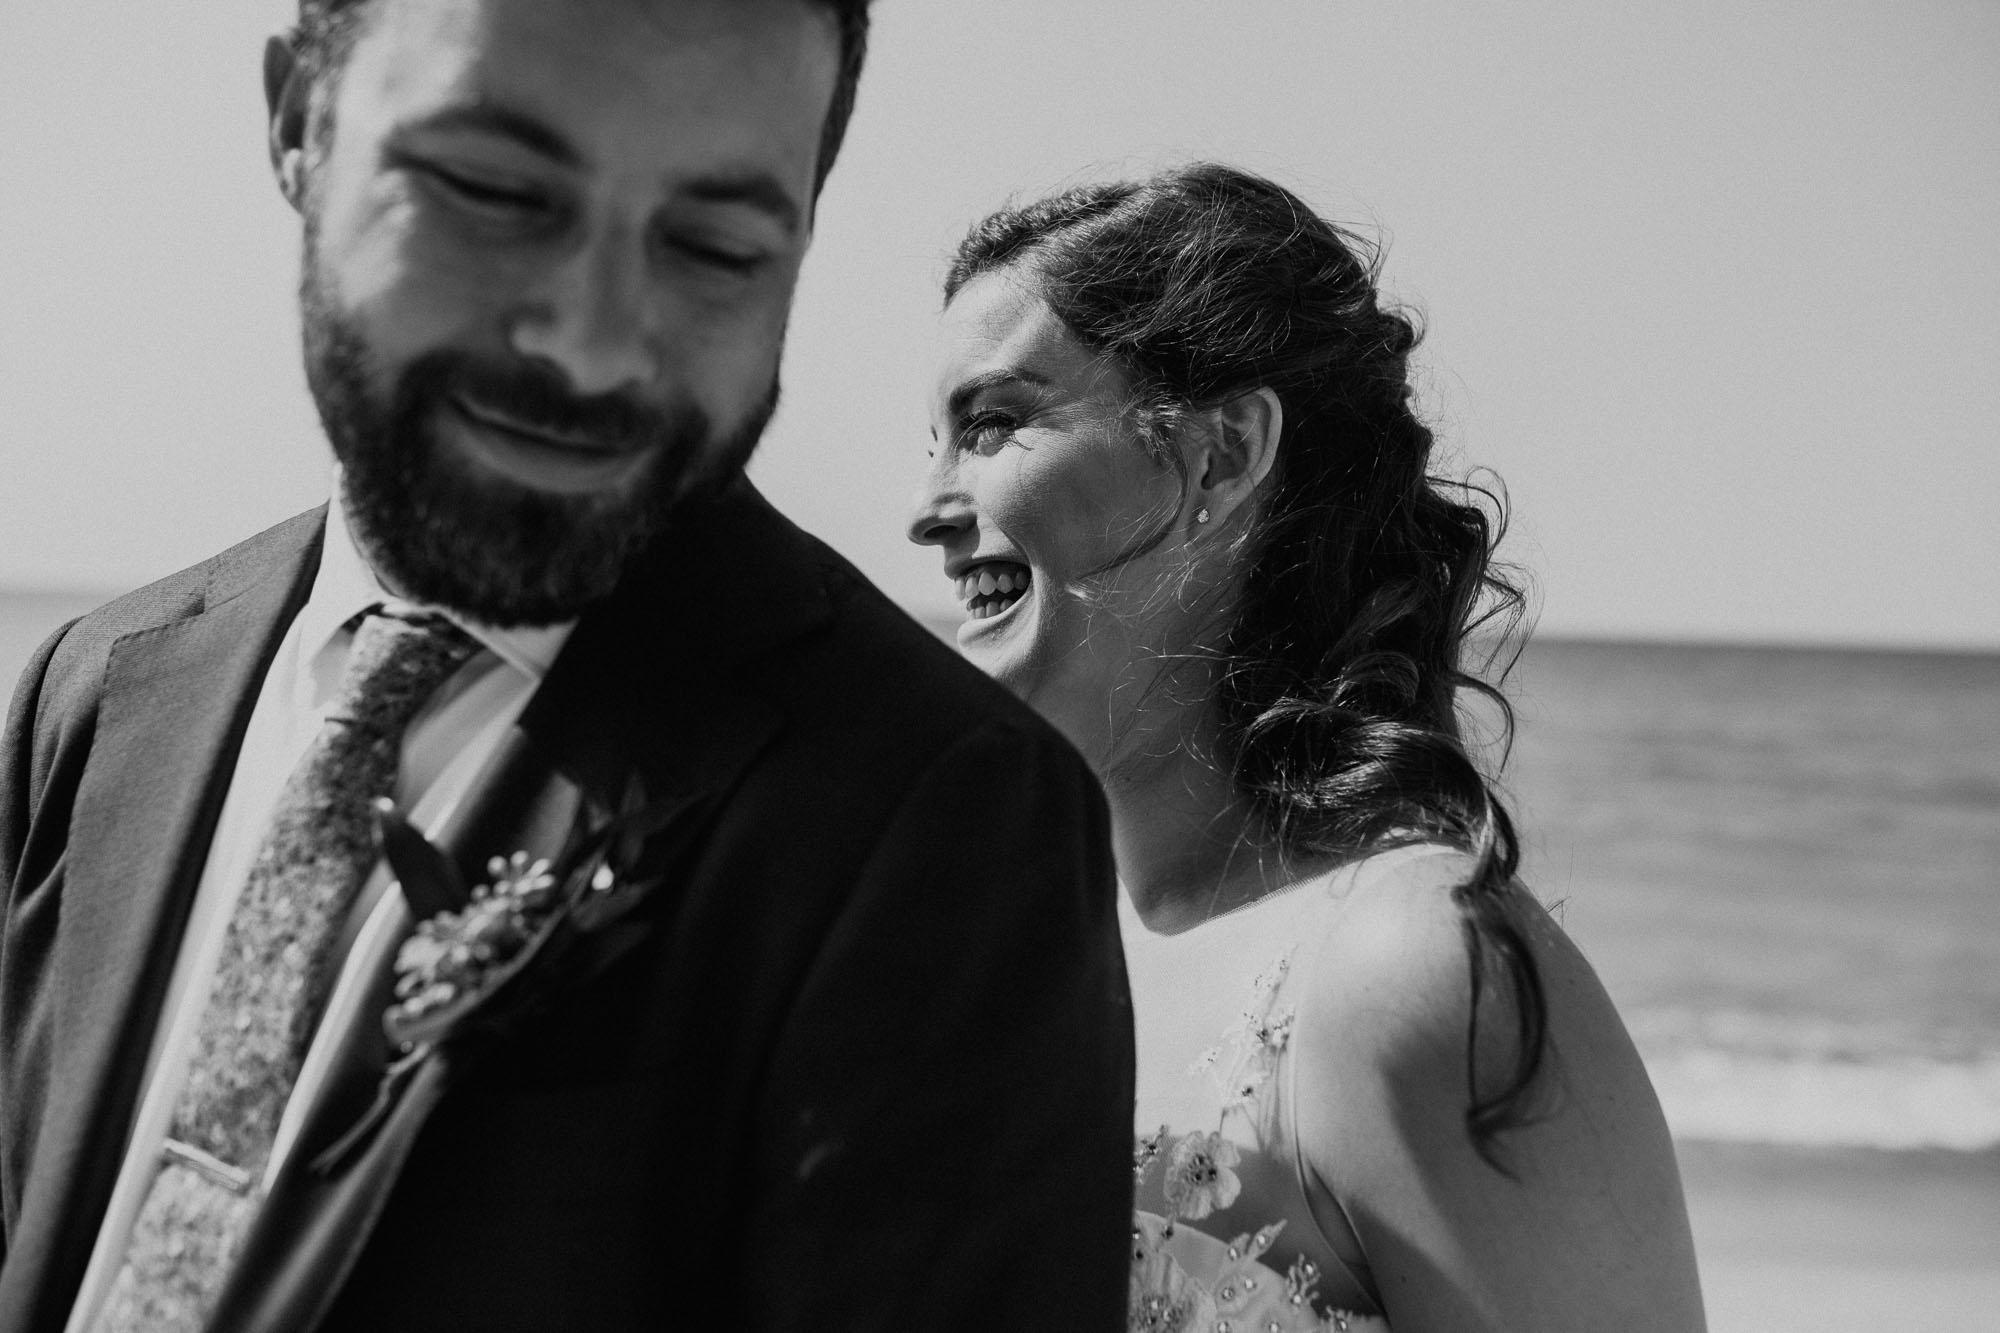 journeyman_distillery_wedding_photographer_chicago_il_wright_photographs-2838.jpg